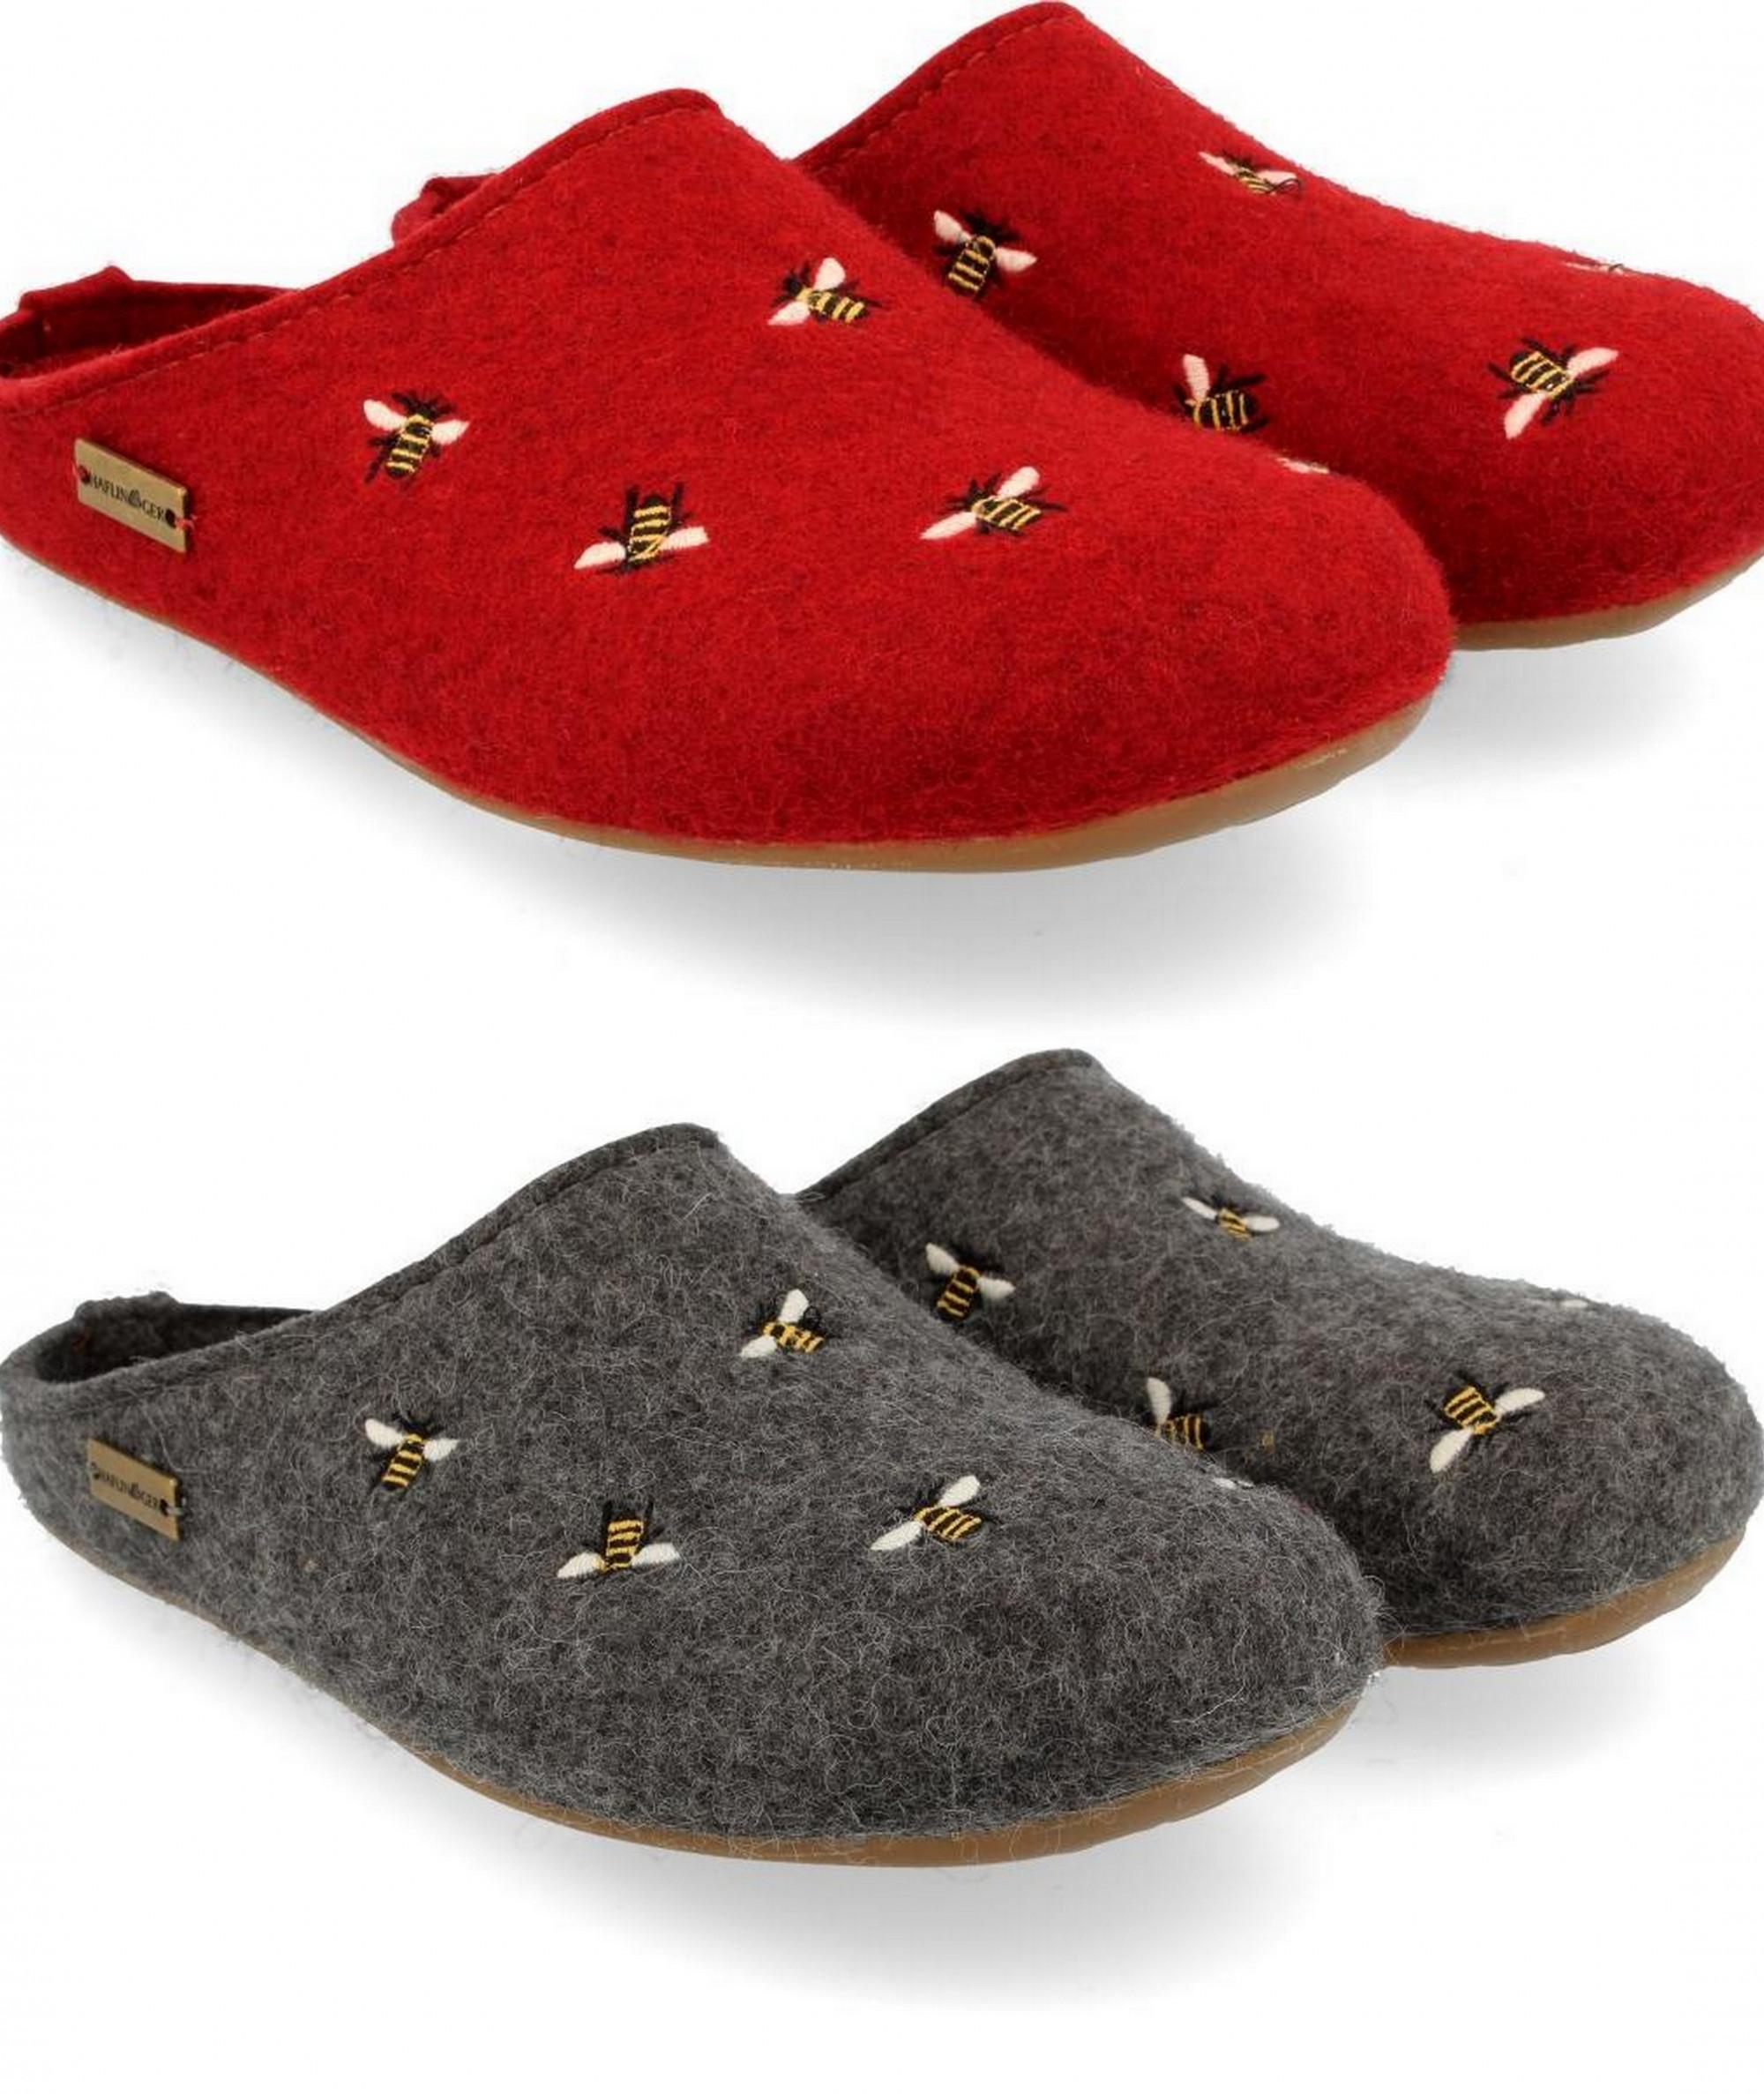 Pantofole HAFLINGER Soft 311010552 marrone in feltro lana